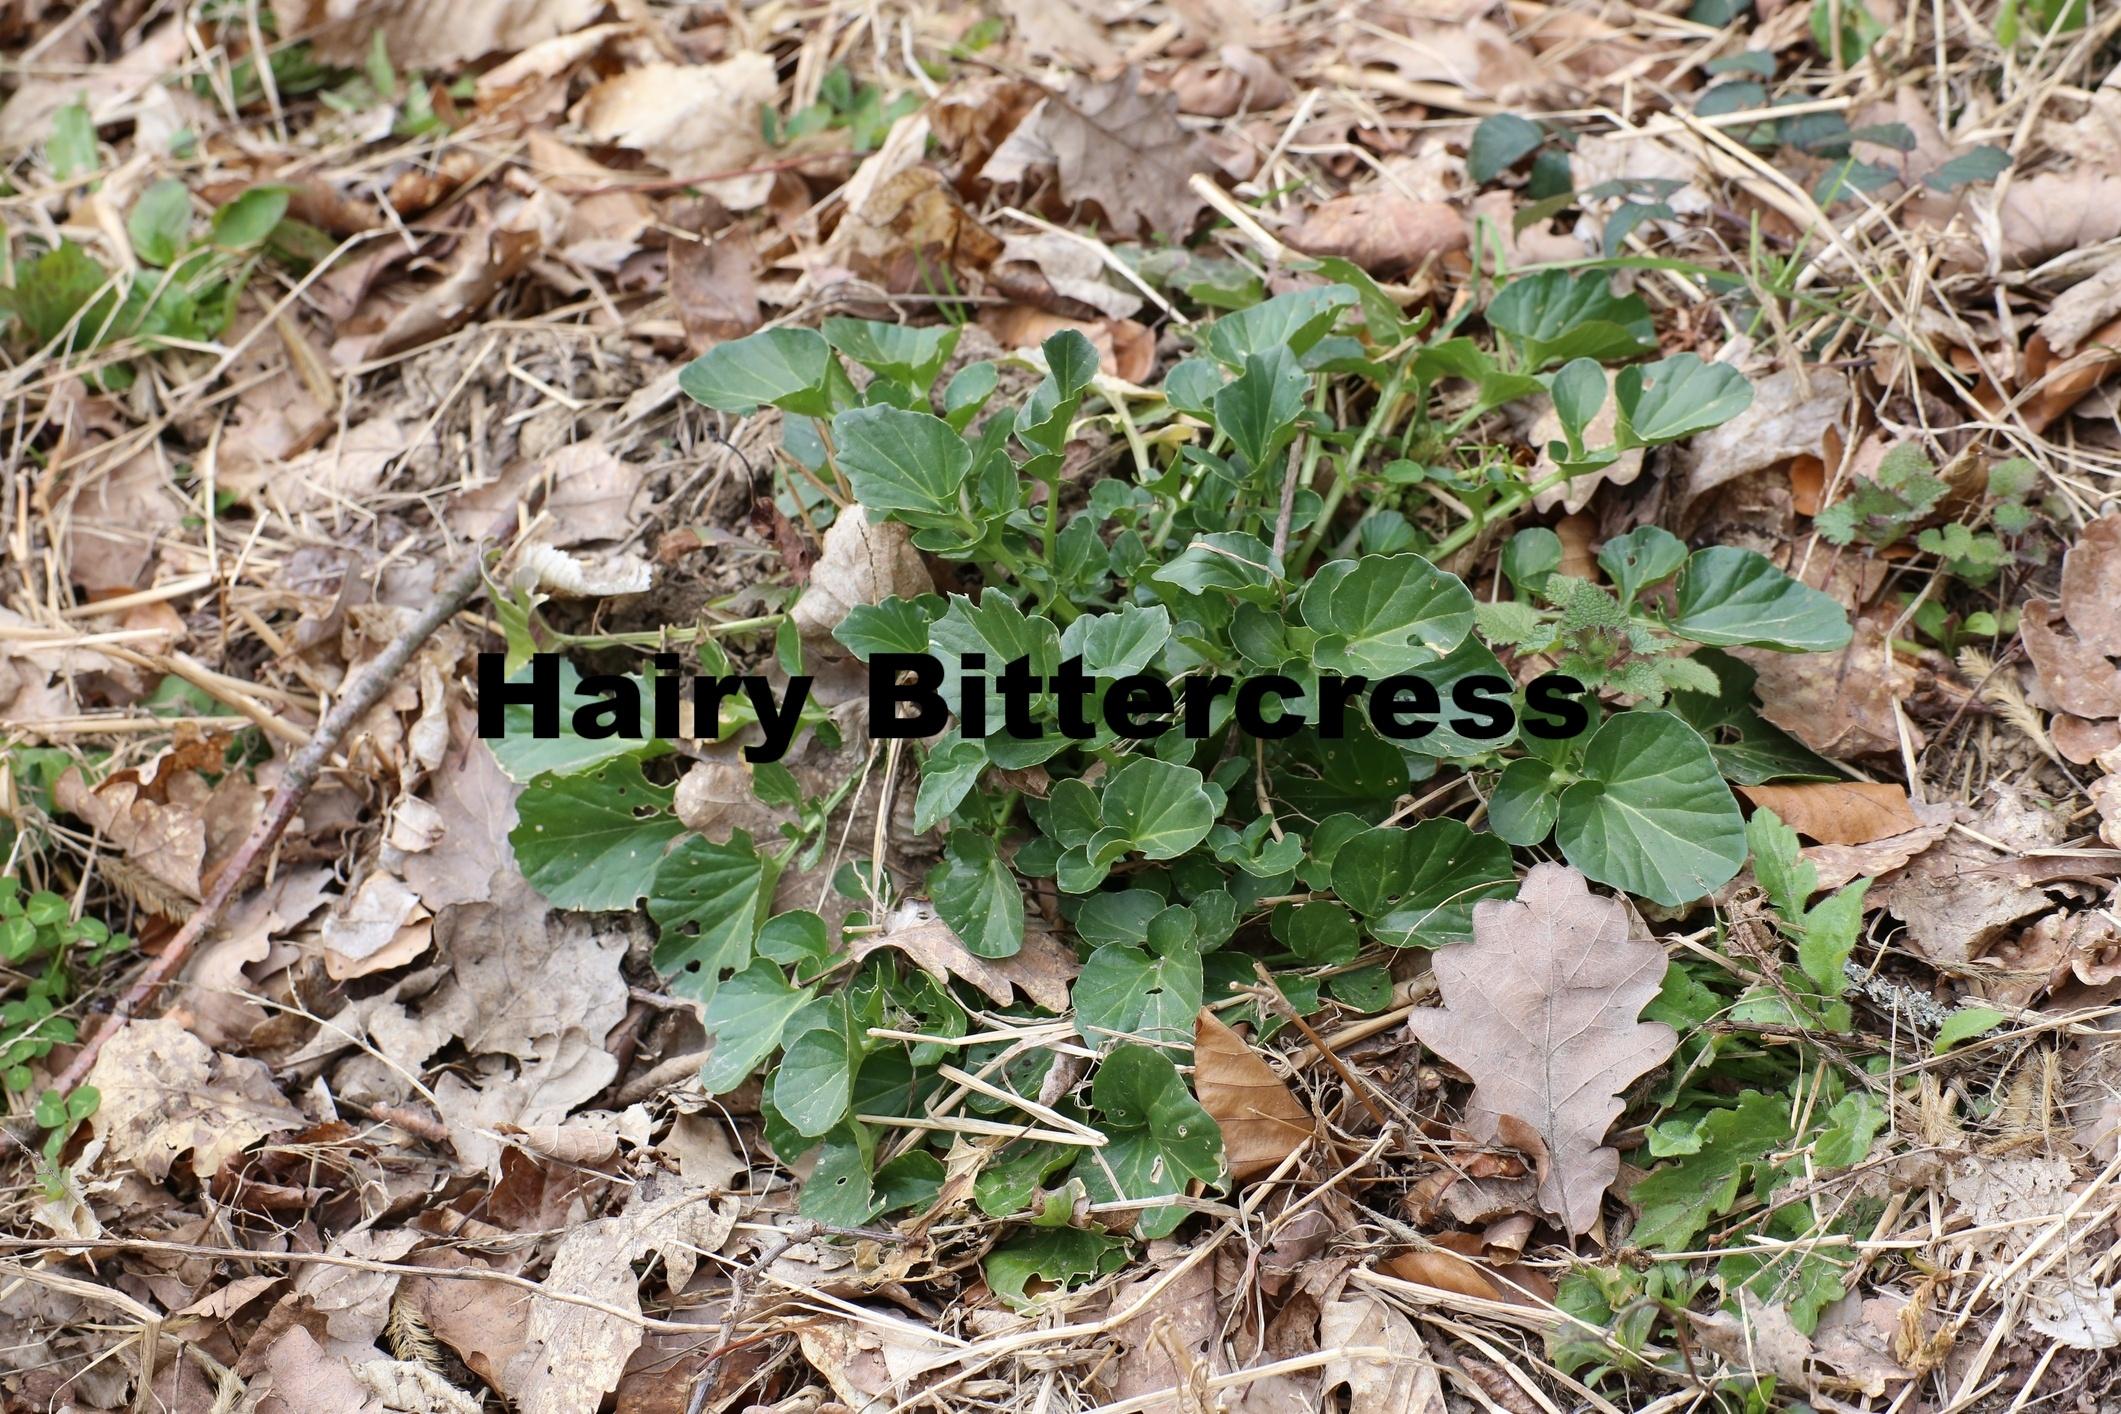 Hairy-Bittercress-Identification-844258-edited.jpg